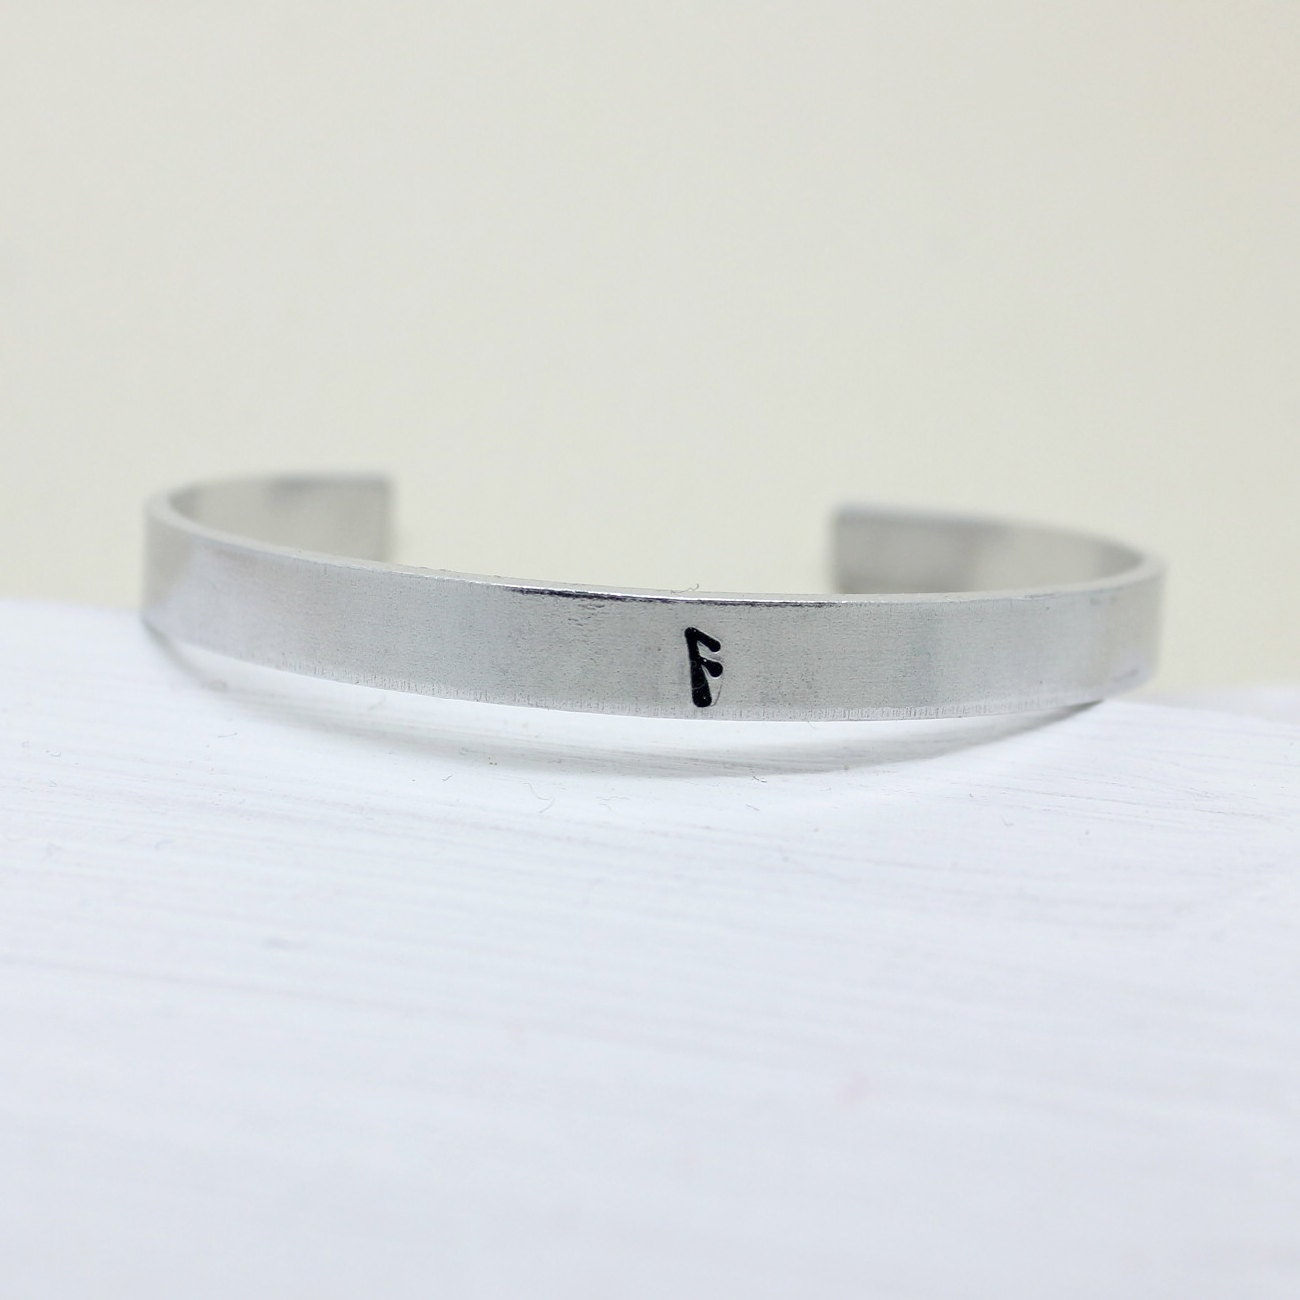 Viking Rune personalised initial talisman bangle cuff bracelet - adjustable - handstamped